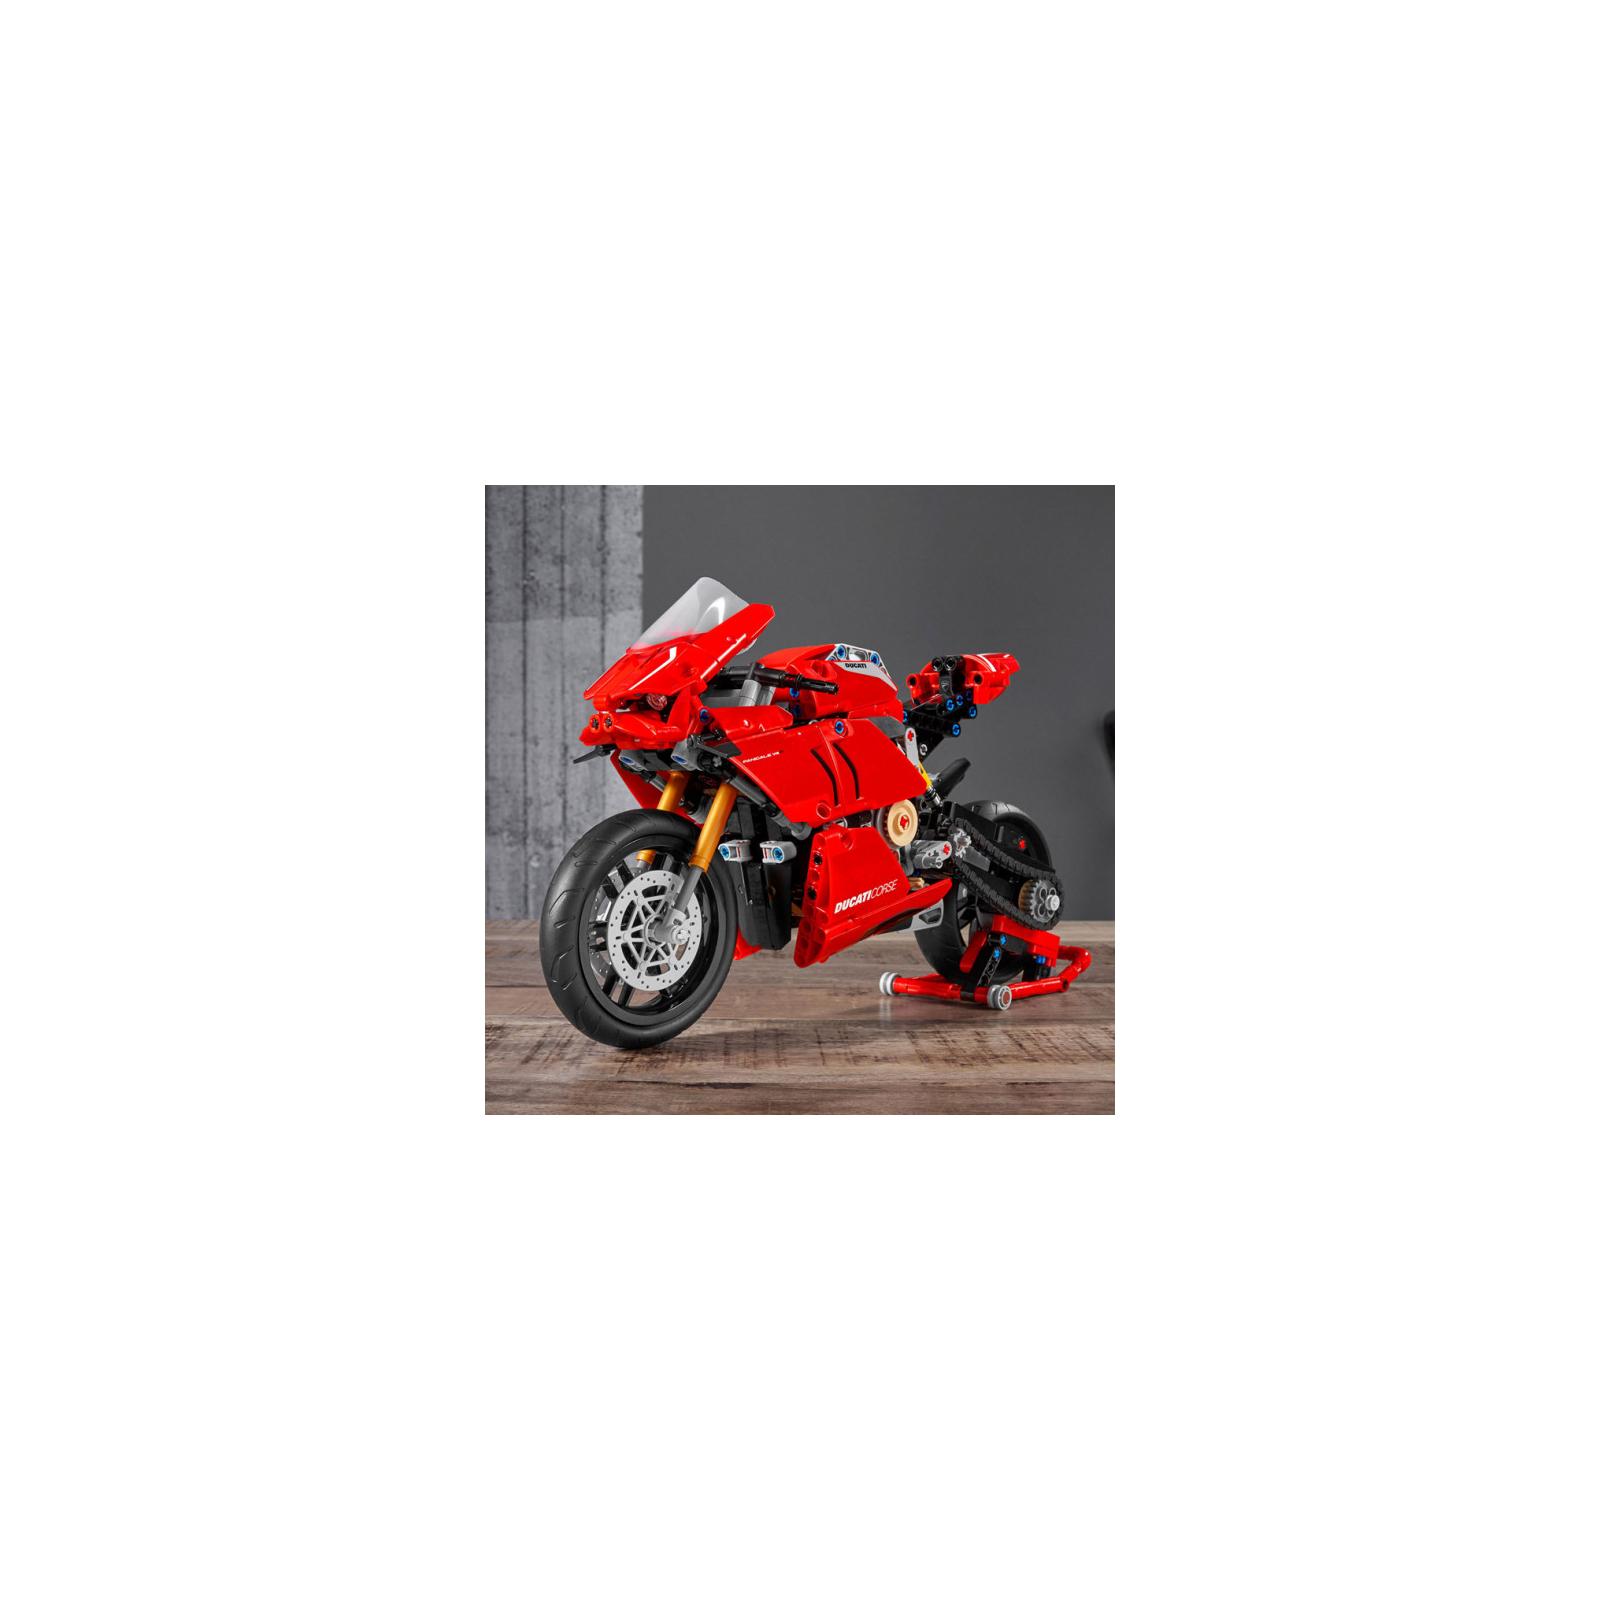 Конструктор LEGO Technic Ducati Panigale V4 R 0 646 детали (42107) изображение 10